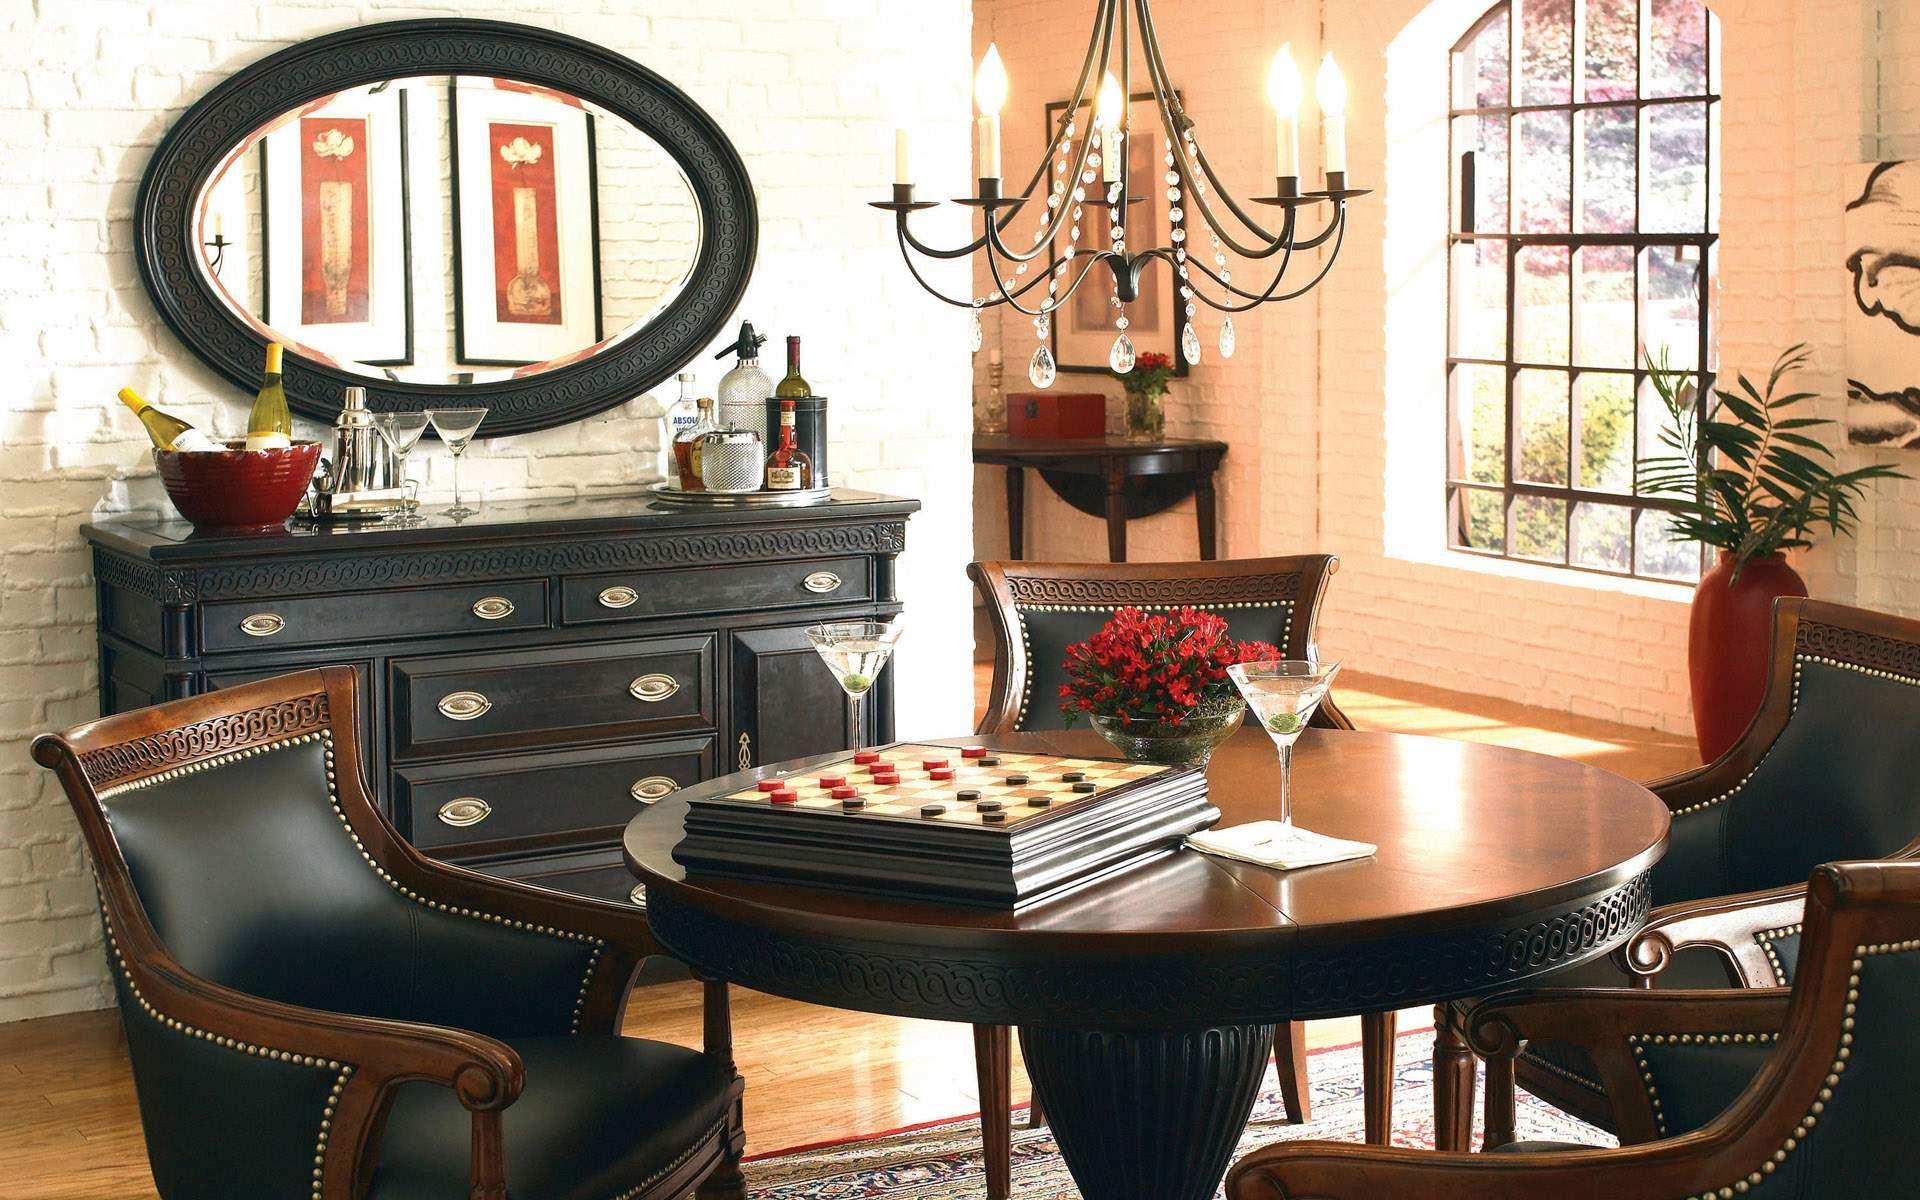 Next Modern Room Interior Design Display Universally Was Awarding 1920x1200